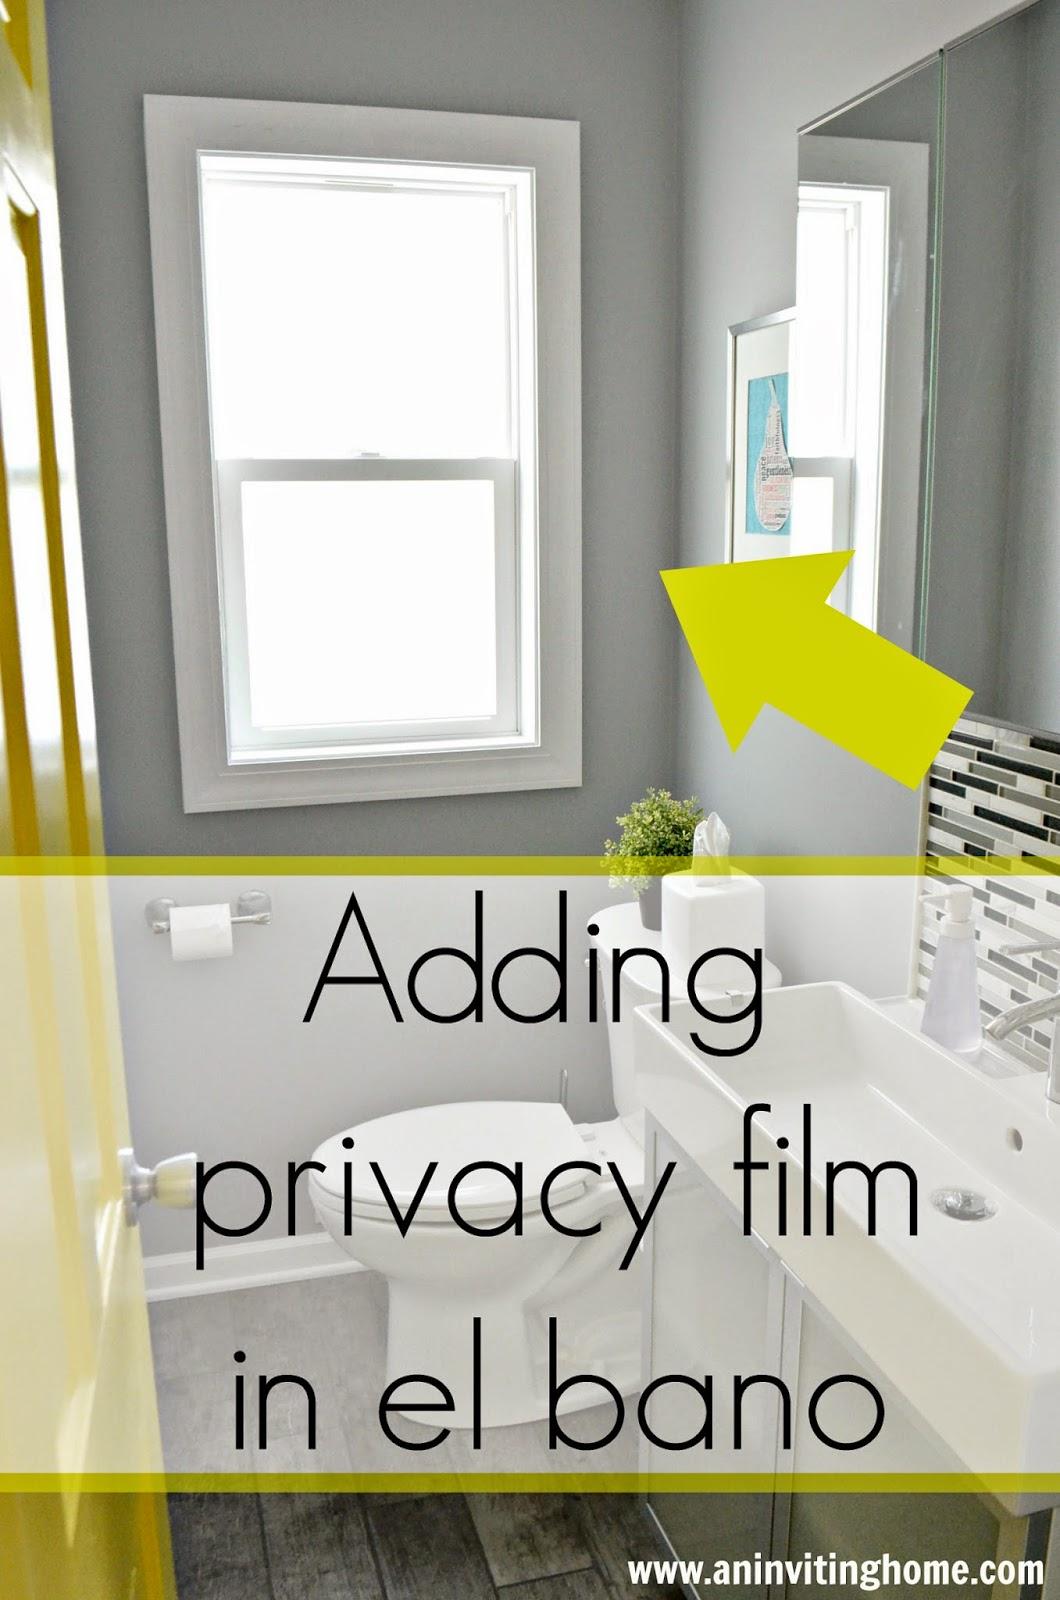 adding privacy film in a bathroom window